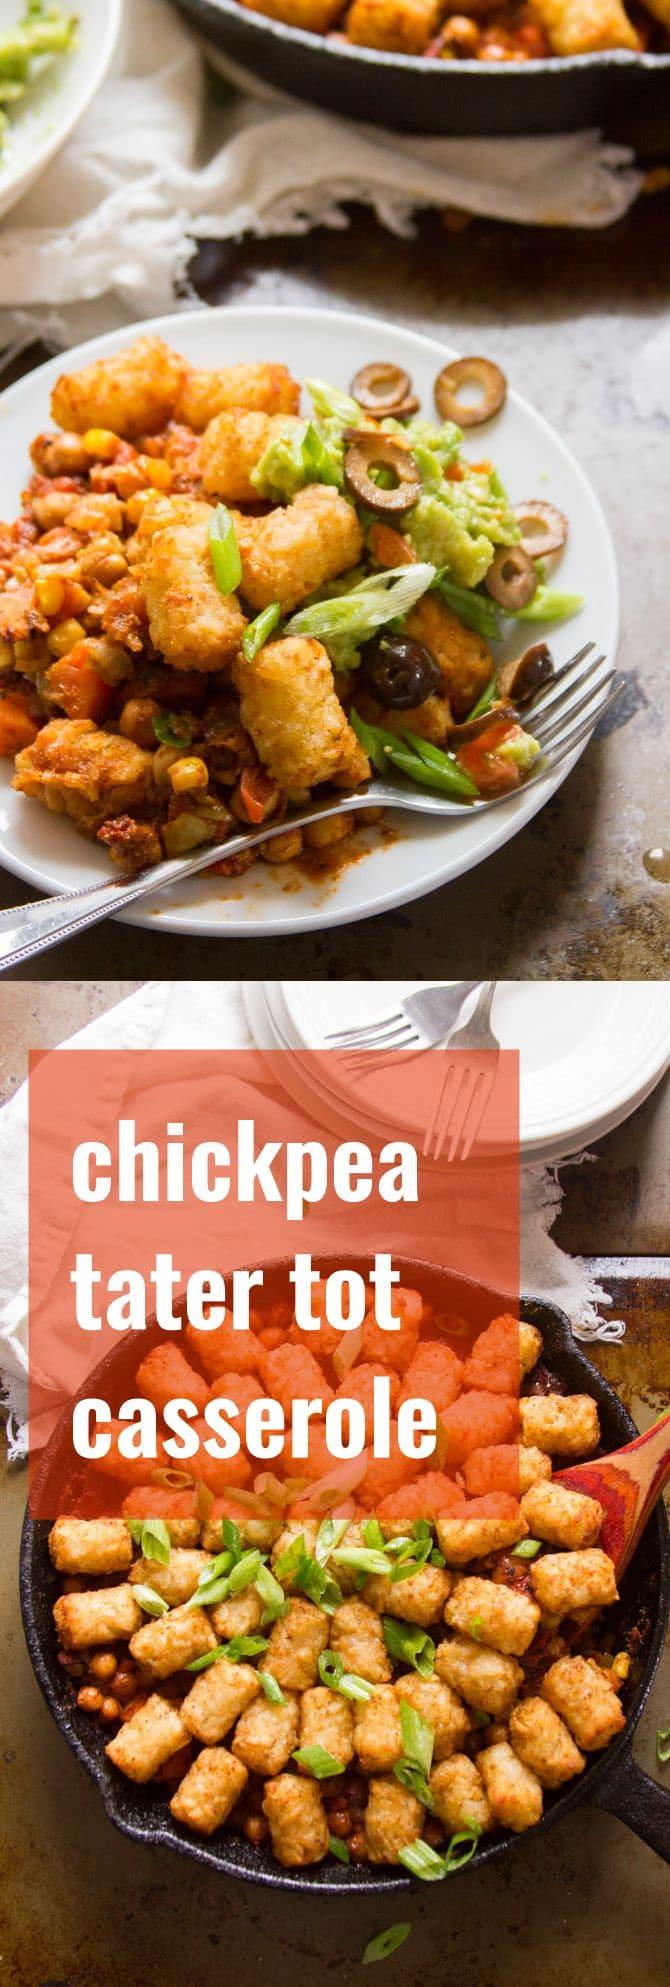 Tex-Mex Chickpea Tater Tot Casserole